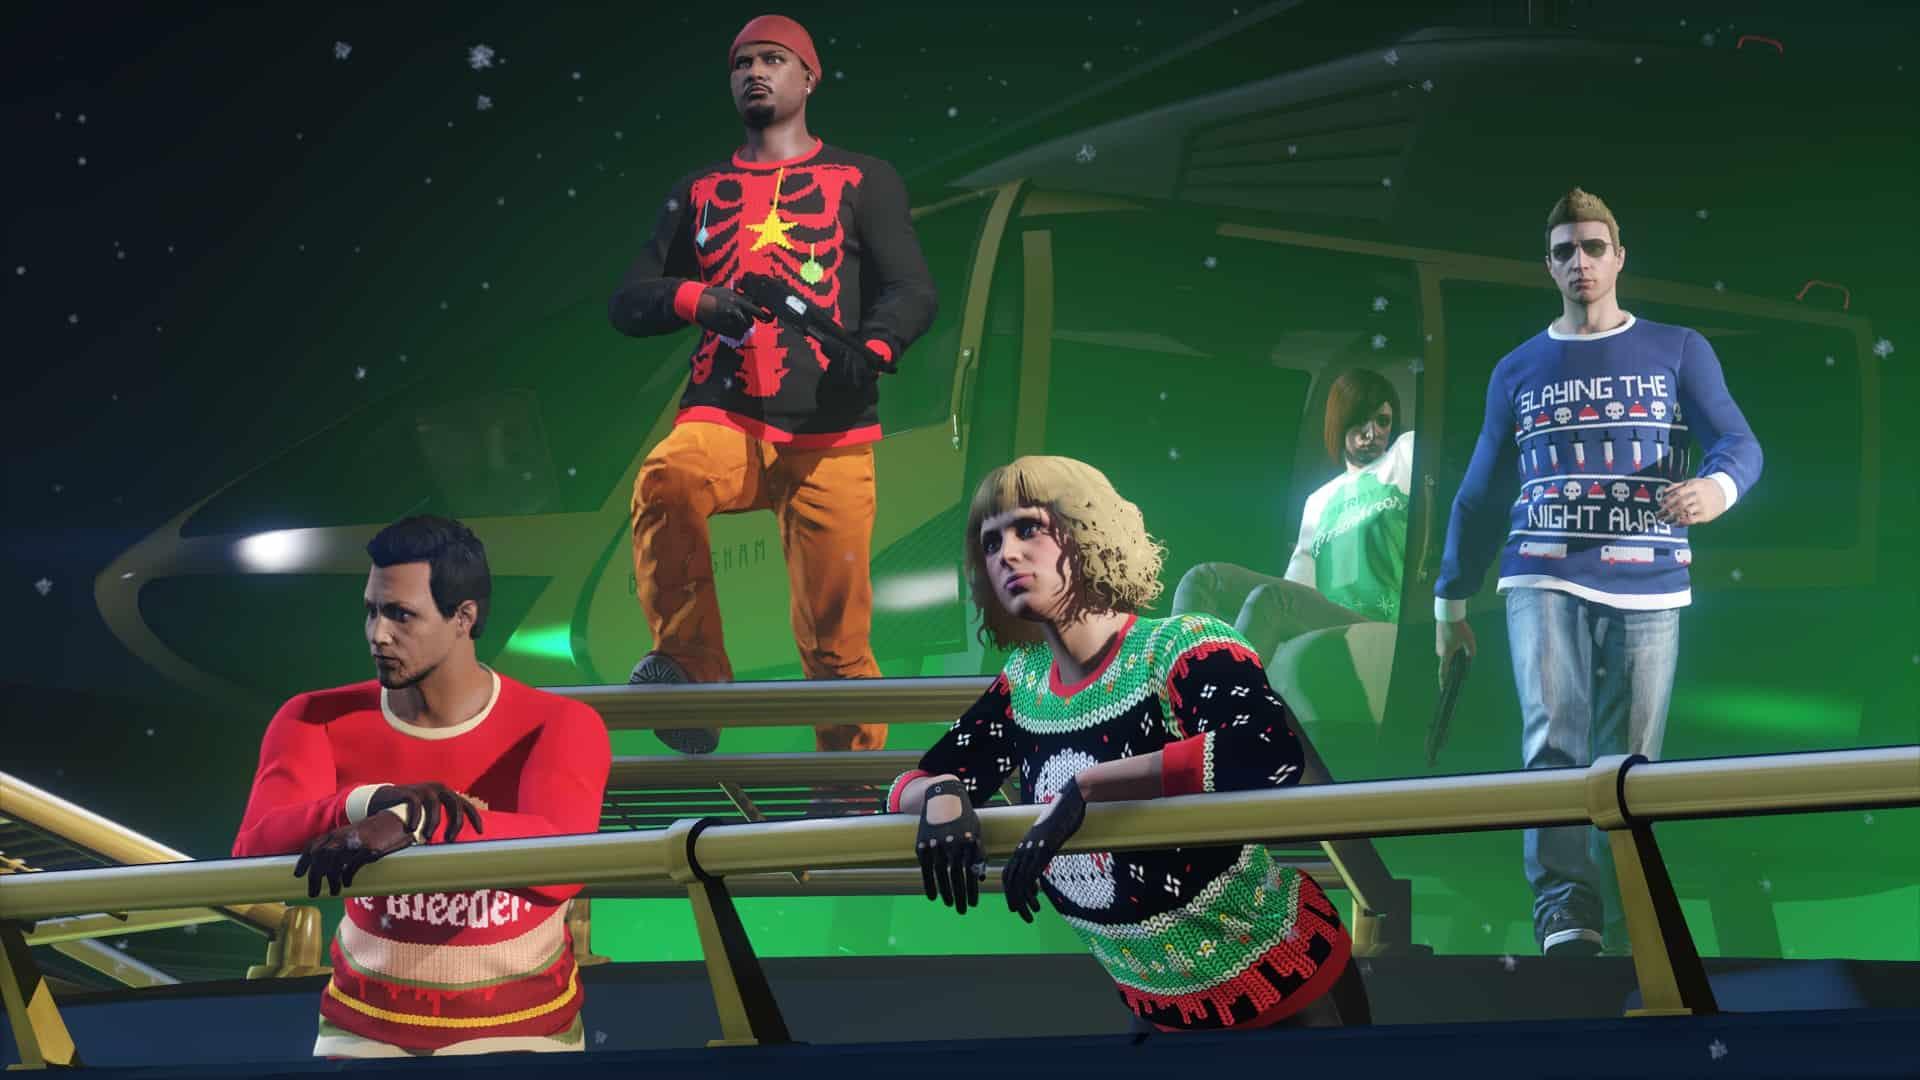 Festive Surprise Brings Holiday Cheer To GTA Online - GTA BOOM